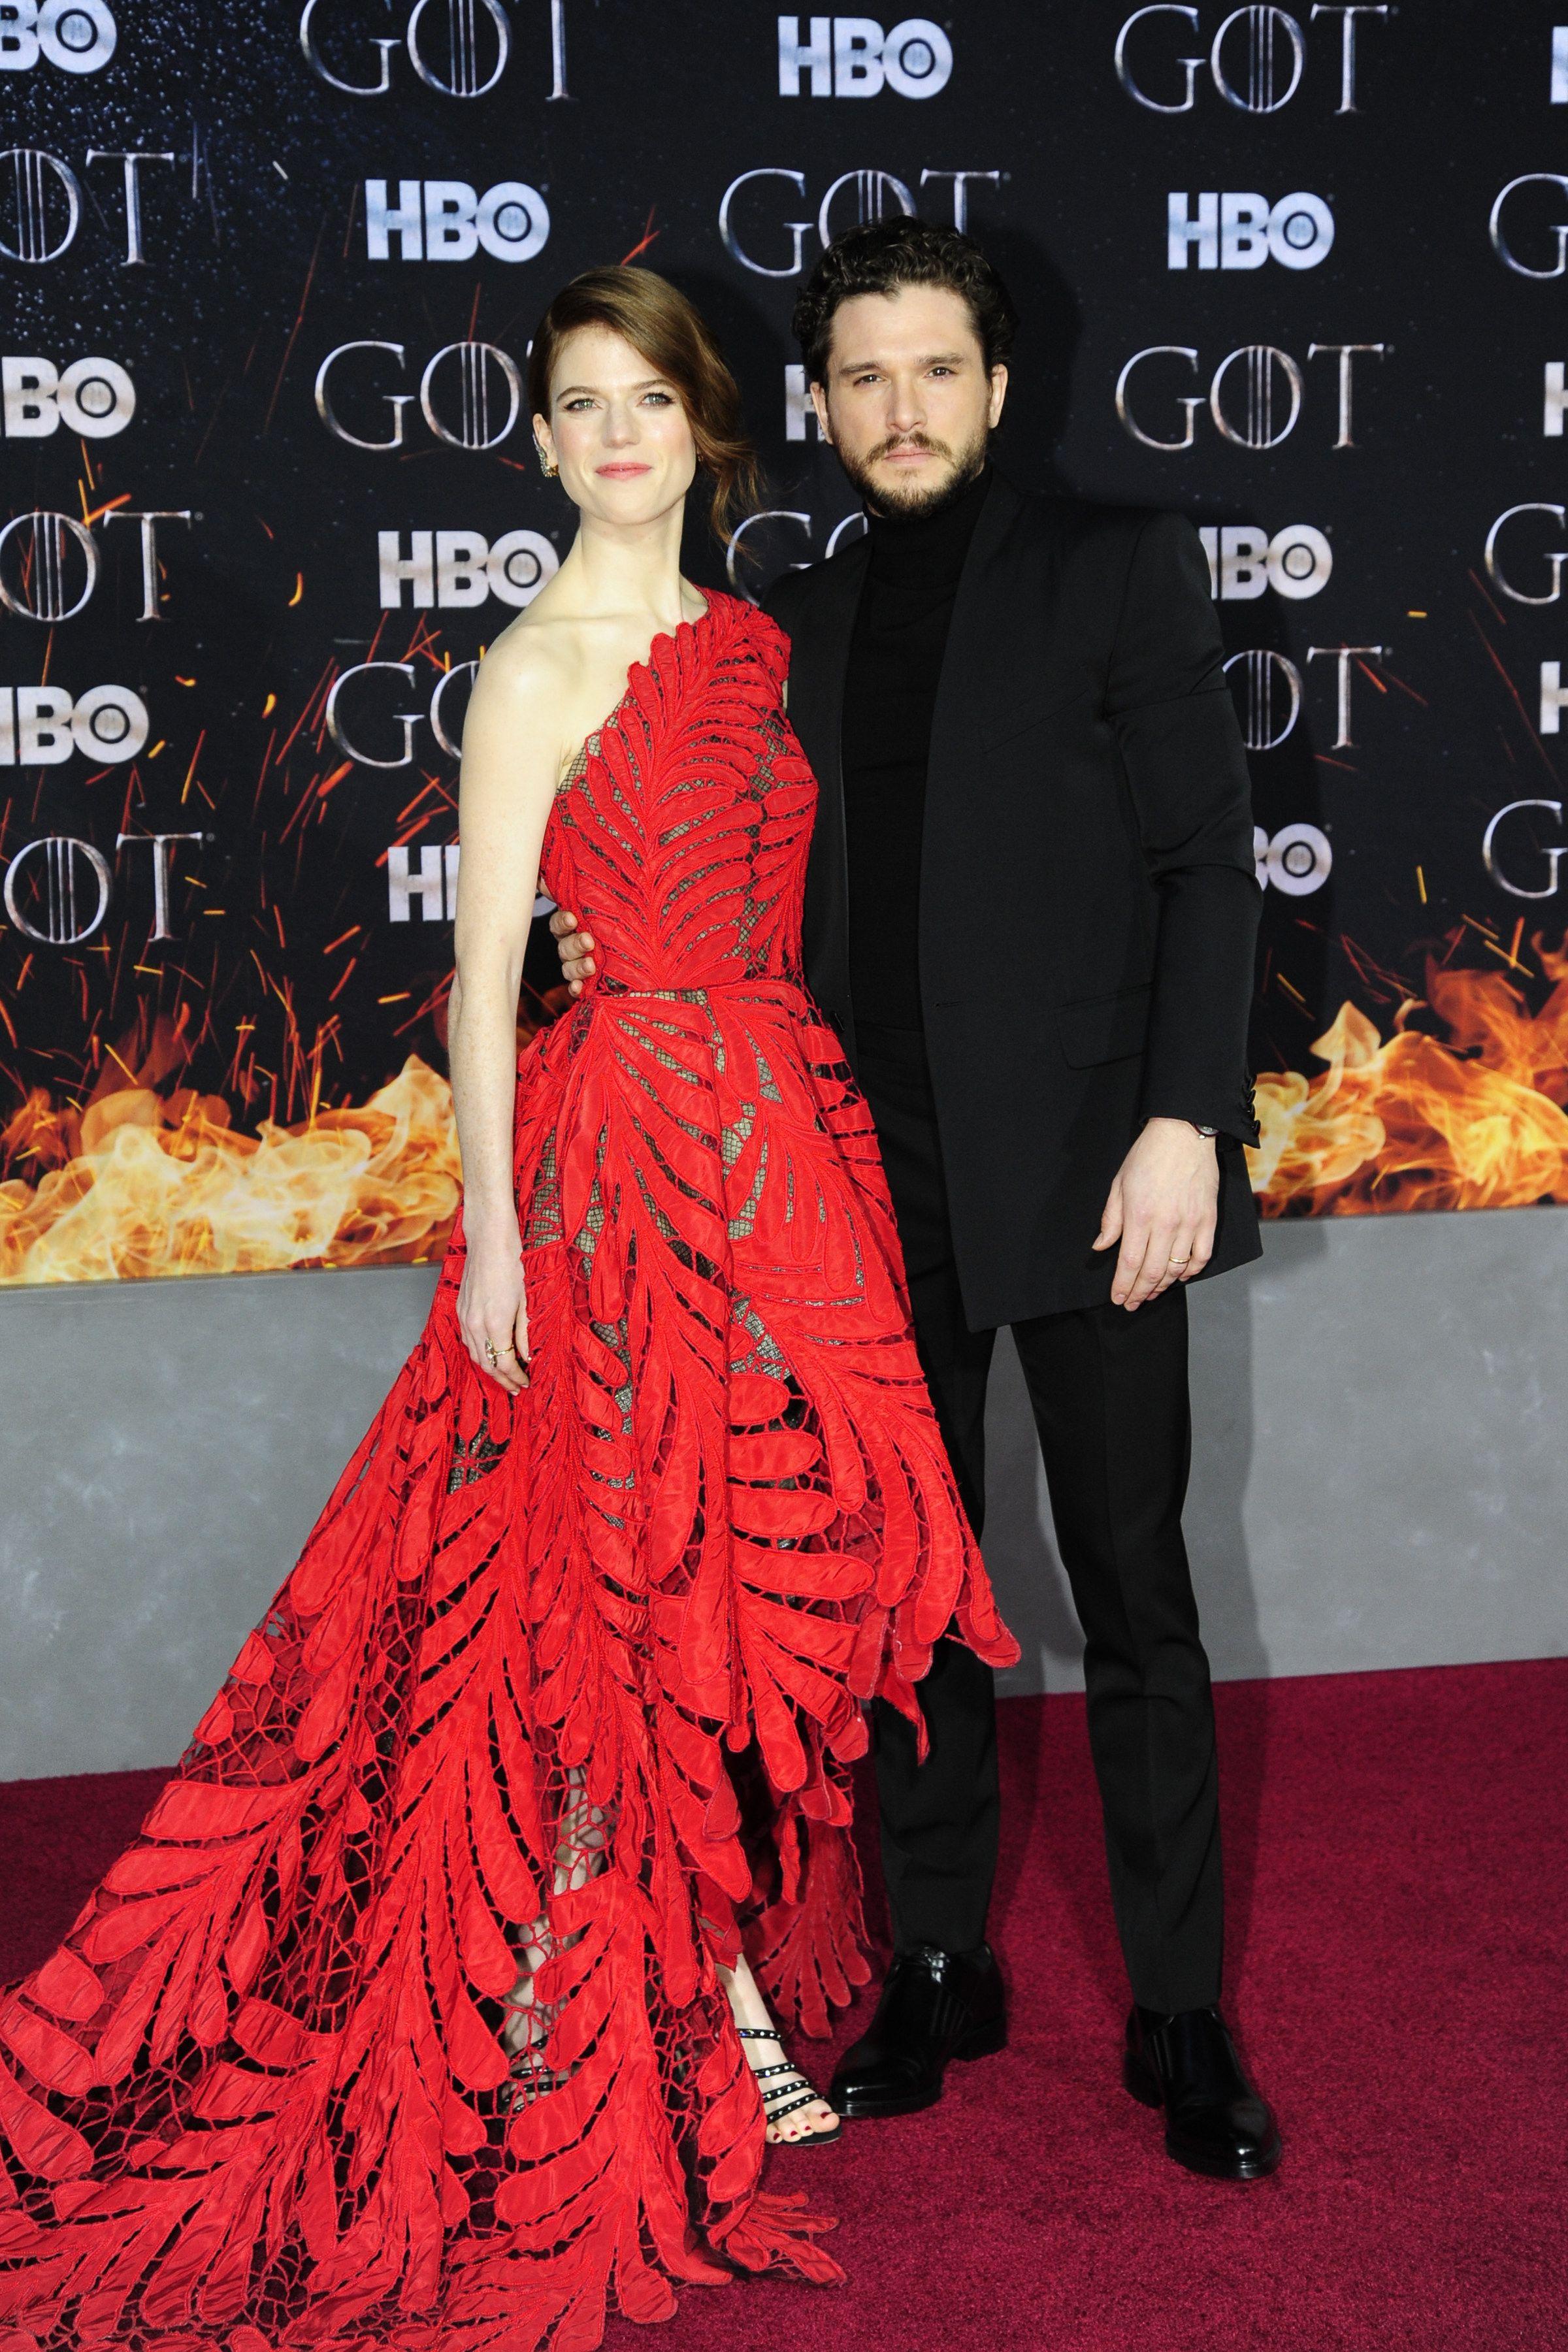 Kit Harington (Jon Snow) and Rose Leslie (Ygritte